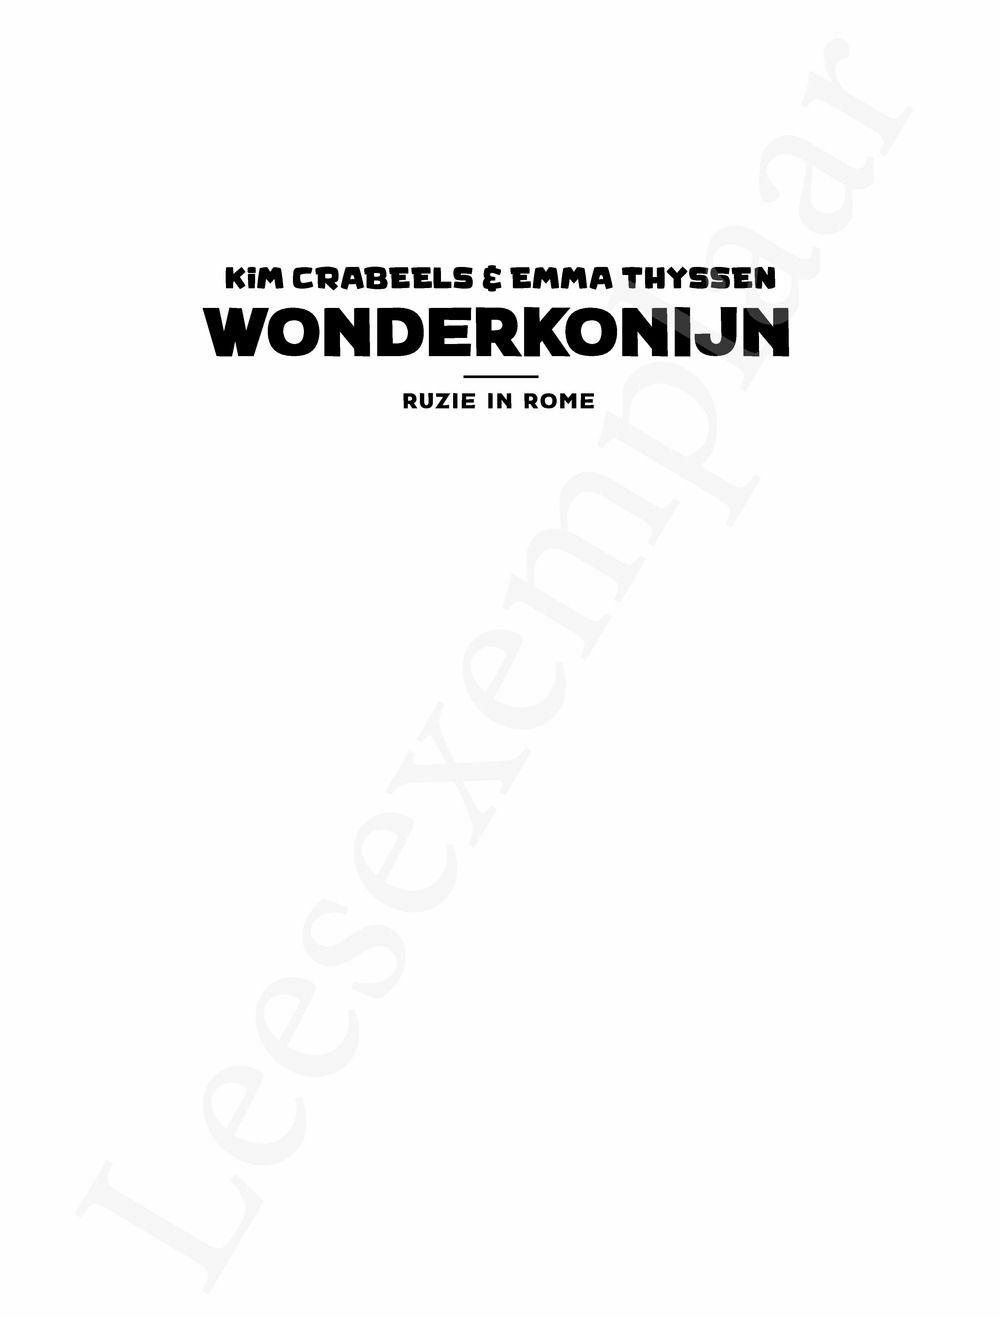 Preview: Wonderkonijn 1: Ruzie in Rome